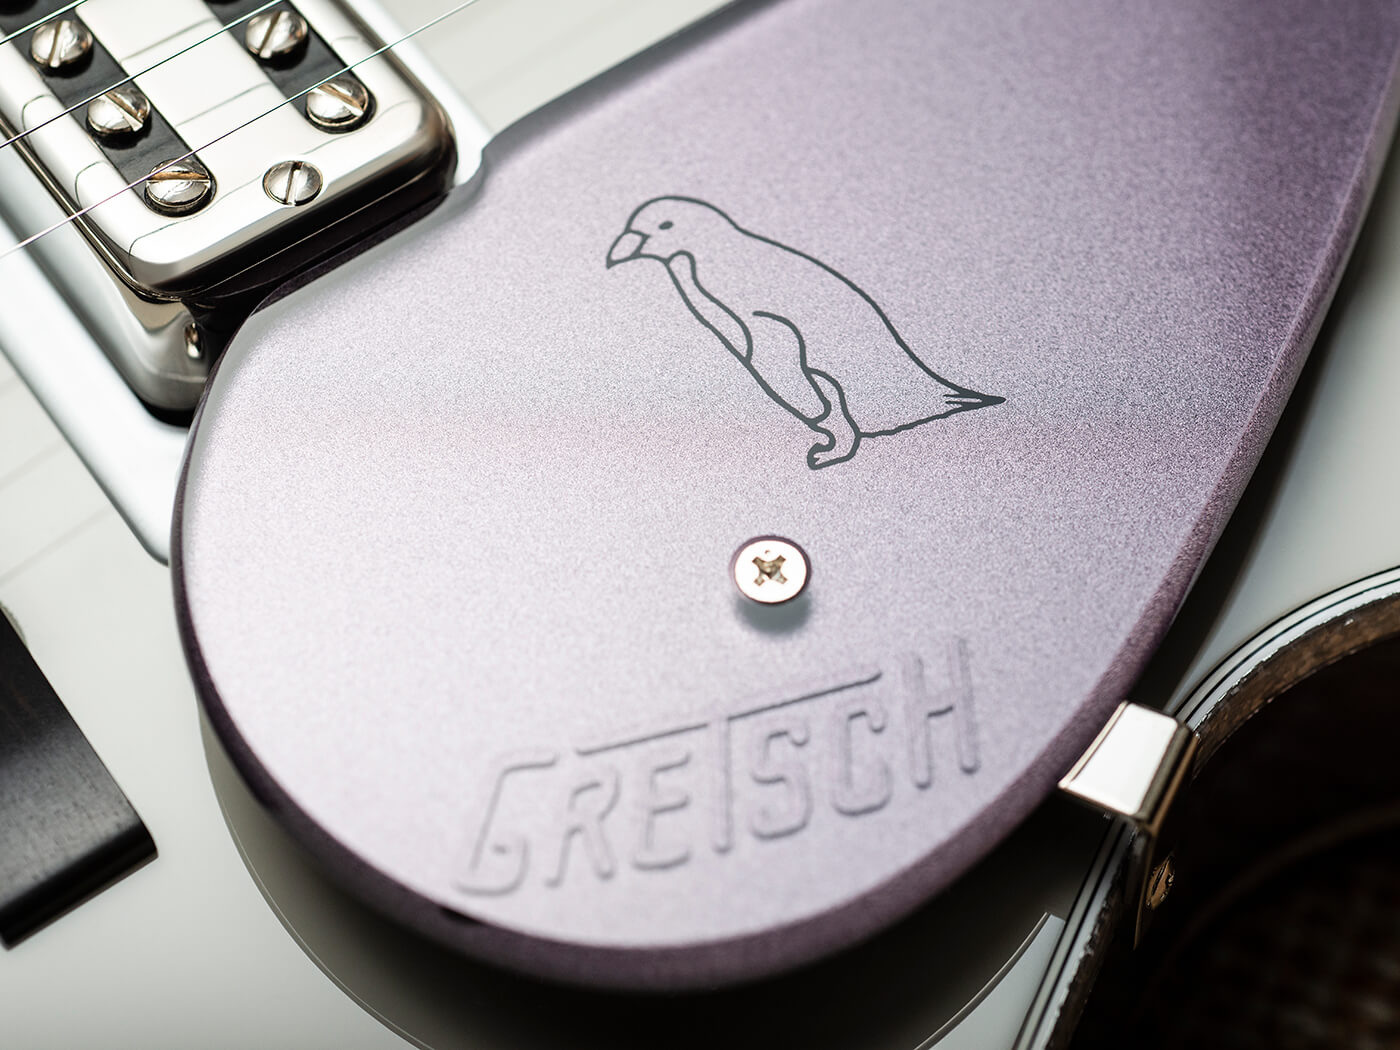 Gretsch Ltd Ed Penguin Pick Guard